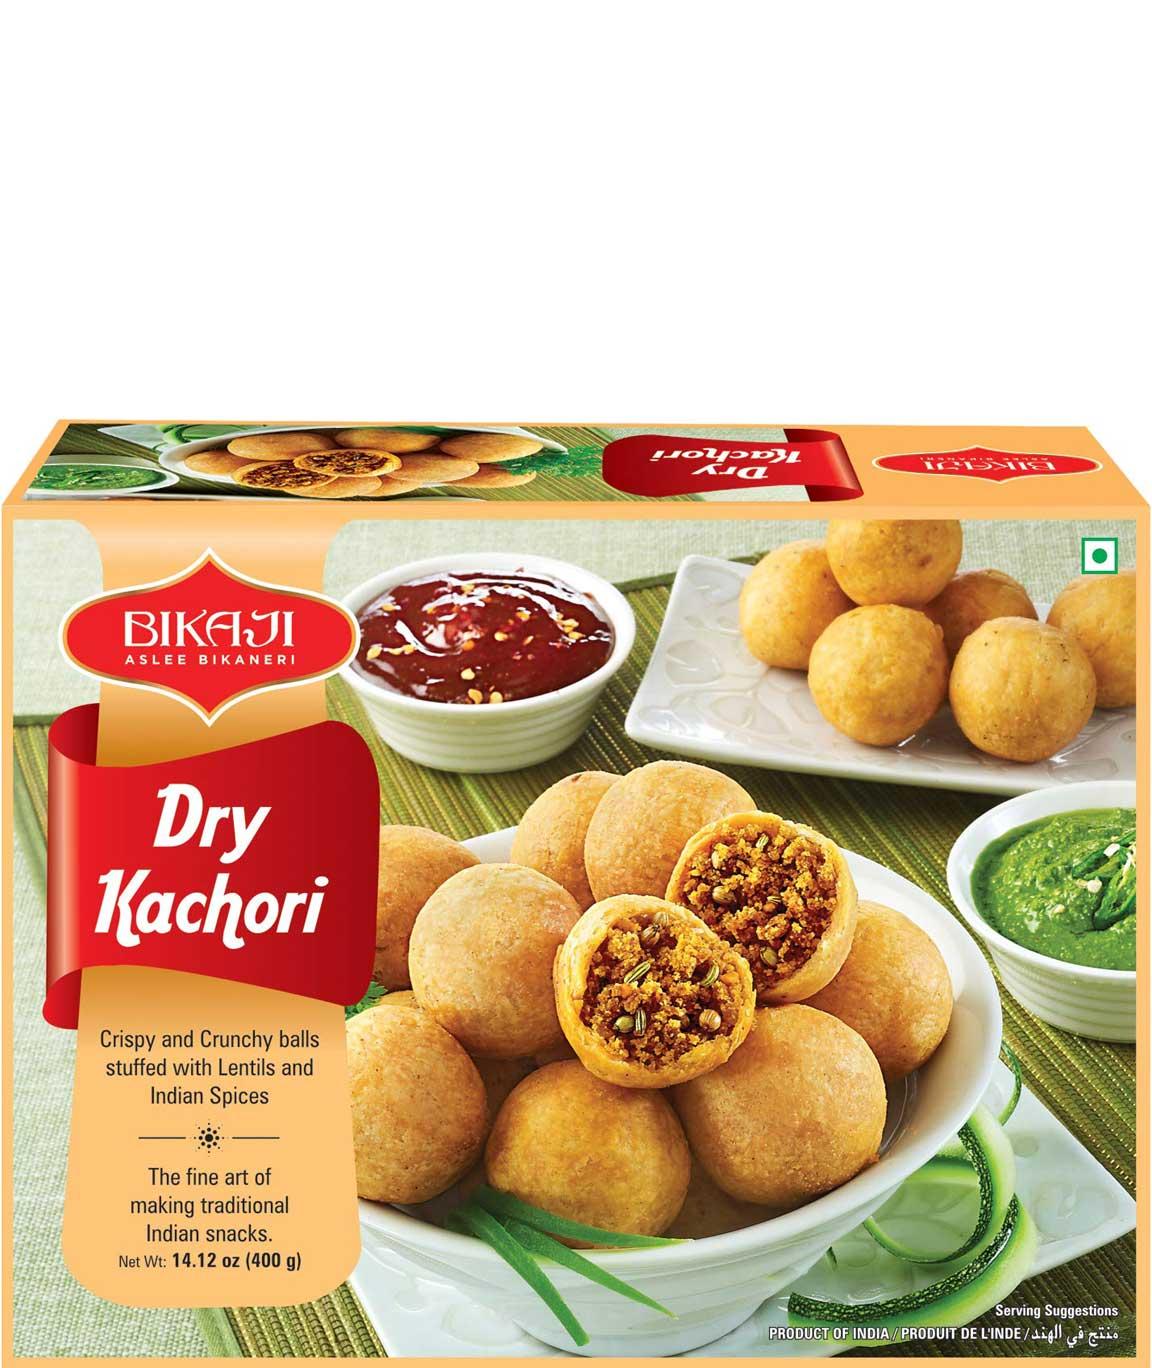 Bikaji Aslee Bikaneri - Dry Kachori 400g - 100% Vegetarian - Indian Namkeen Snack - Pack of 1